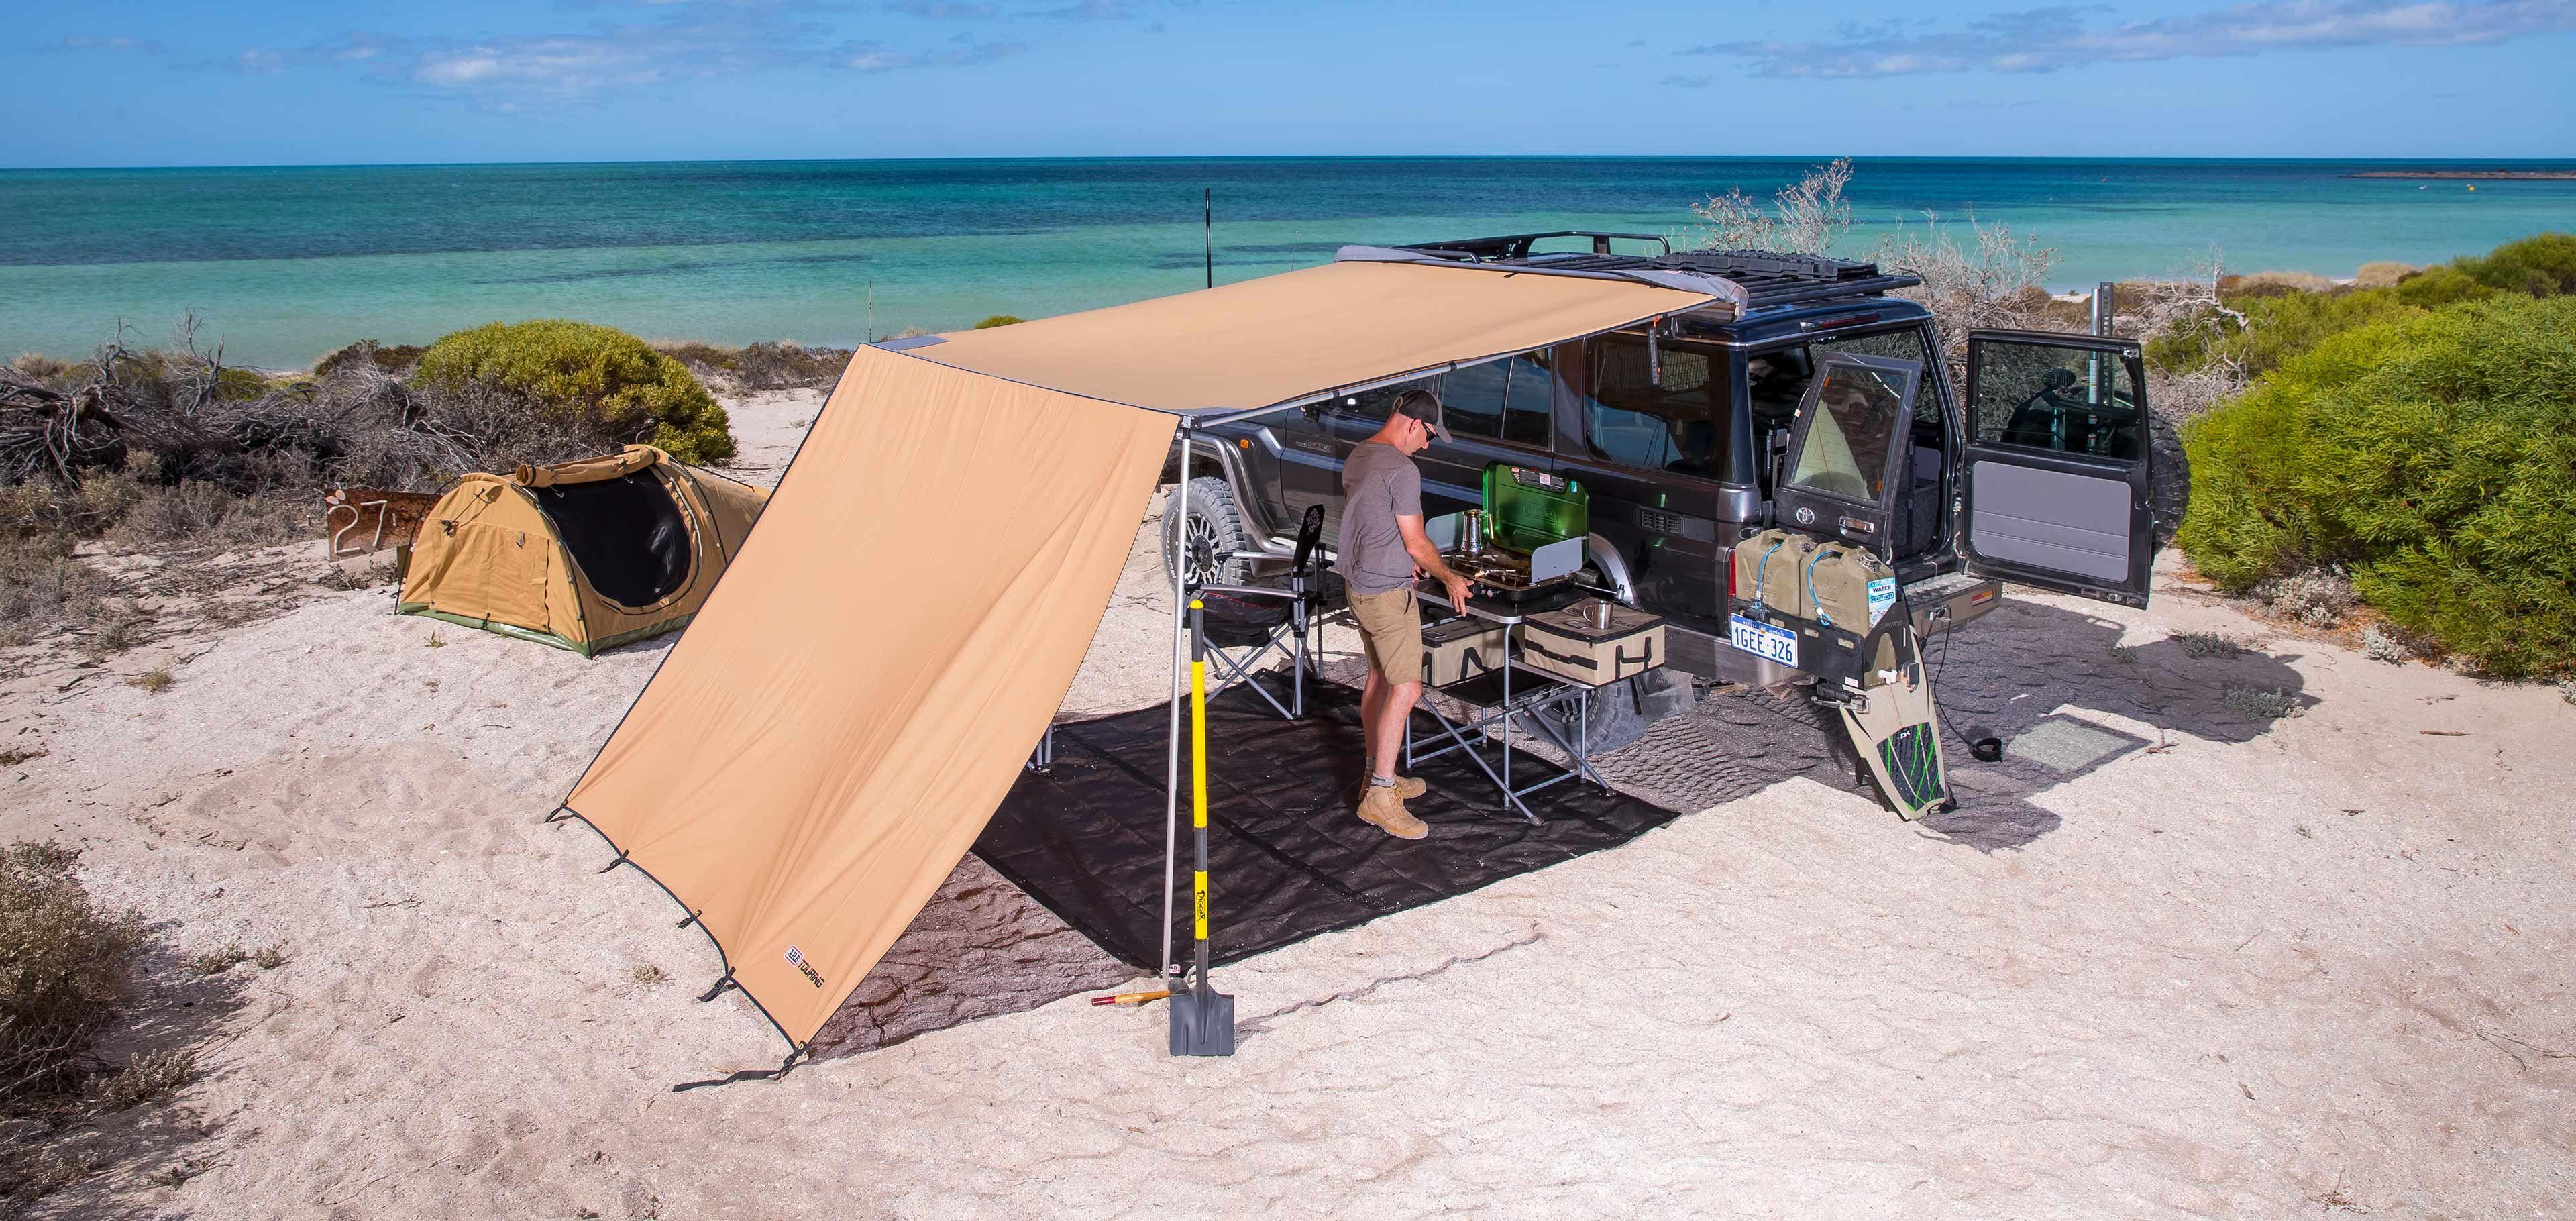 Arb Usa Awnings Accessories Arb Usa Waterproof Awnings Tent Awning Shade Sail